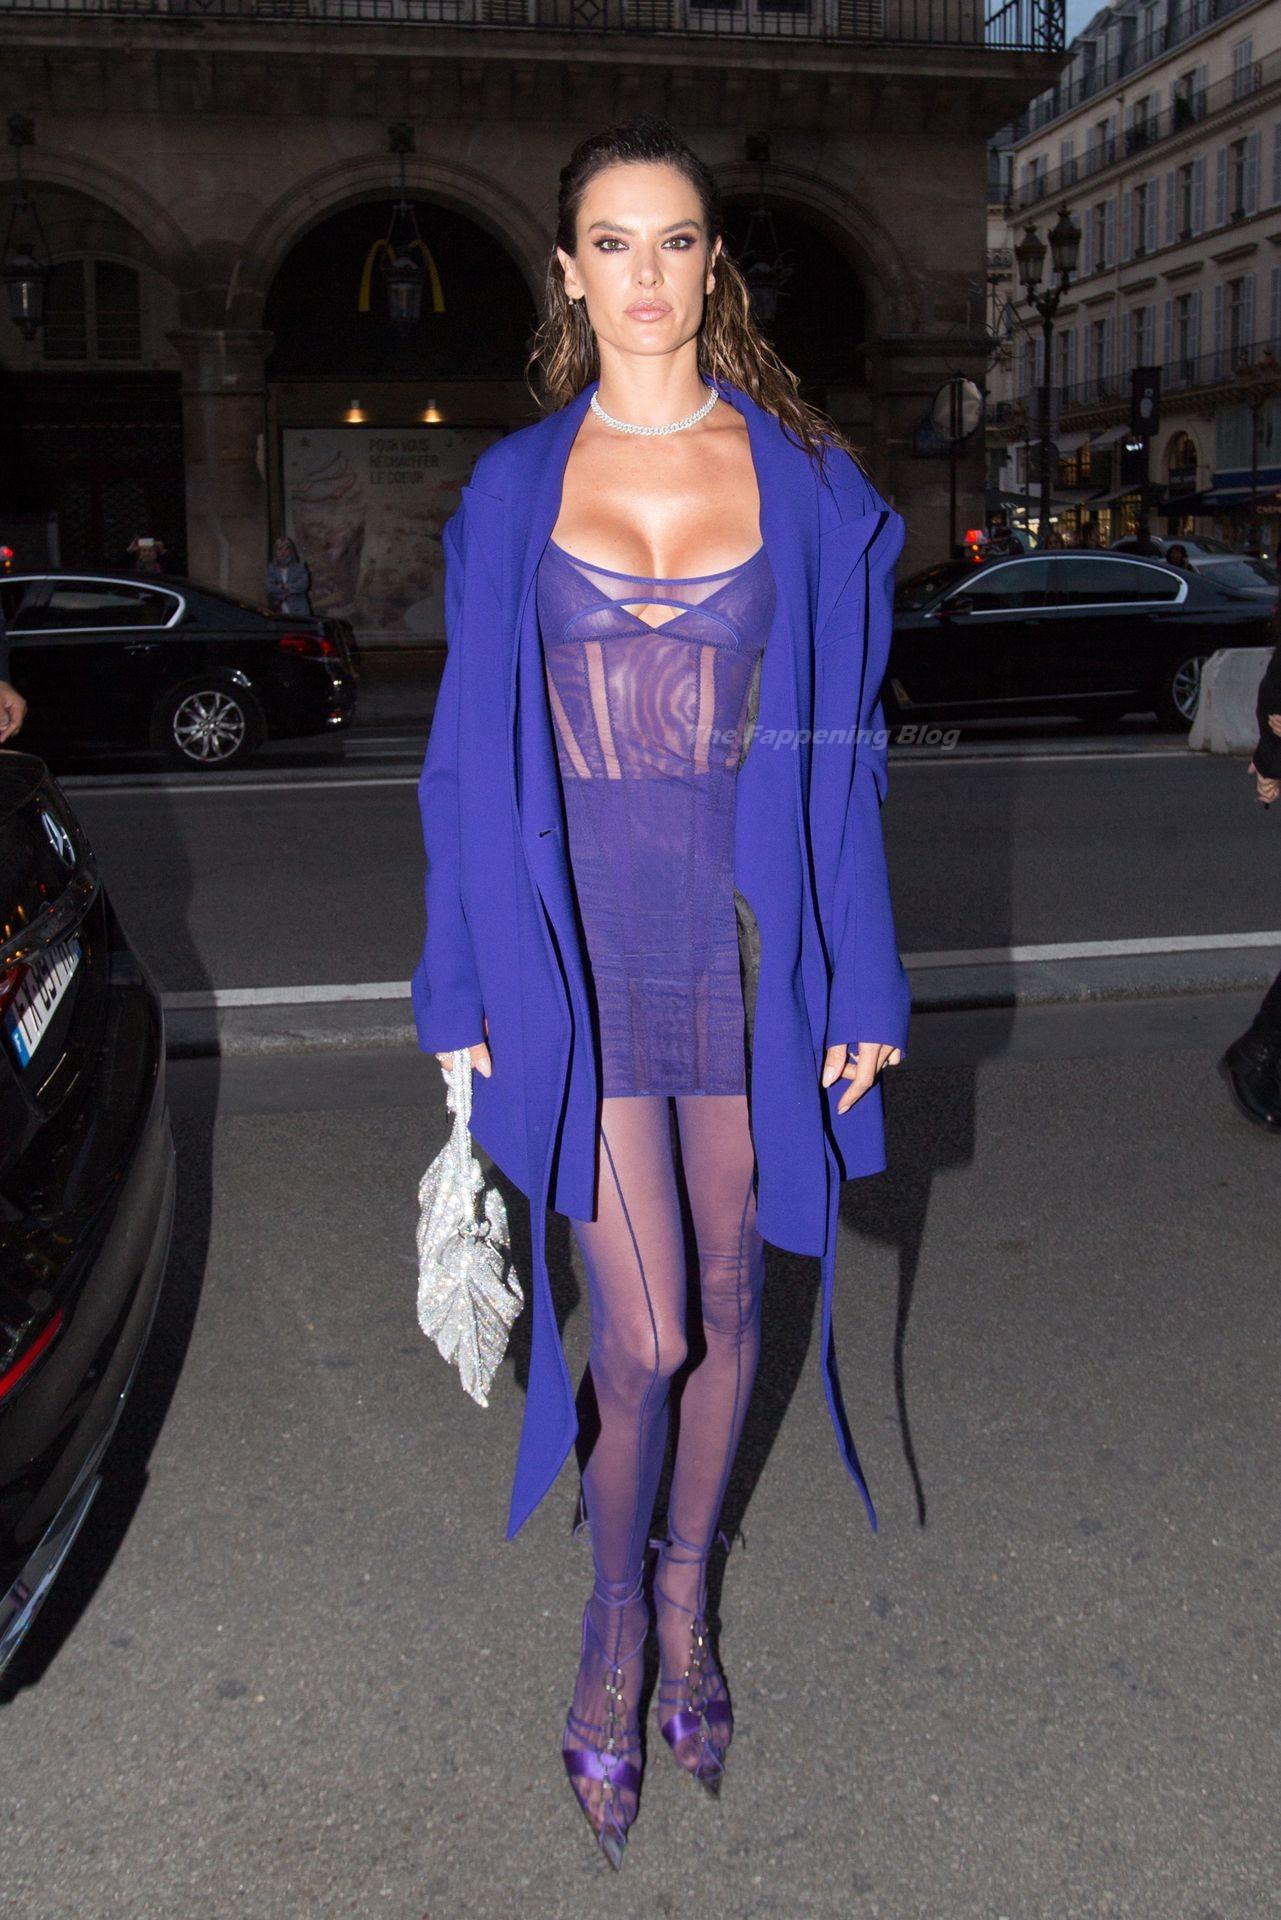 Alessandra-Ambrosio-Sexy-The-Fappening-Blog-3-3.jpg